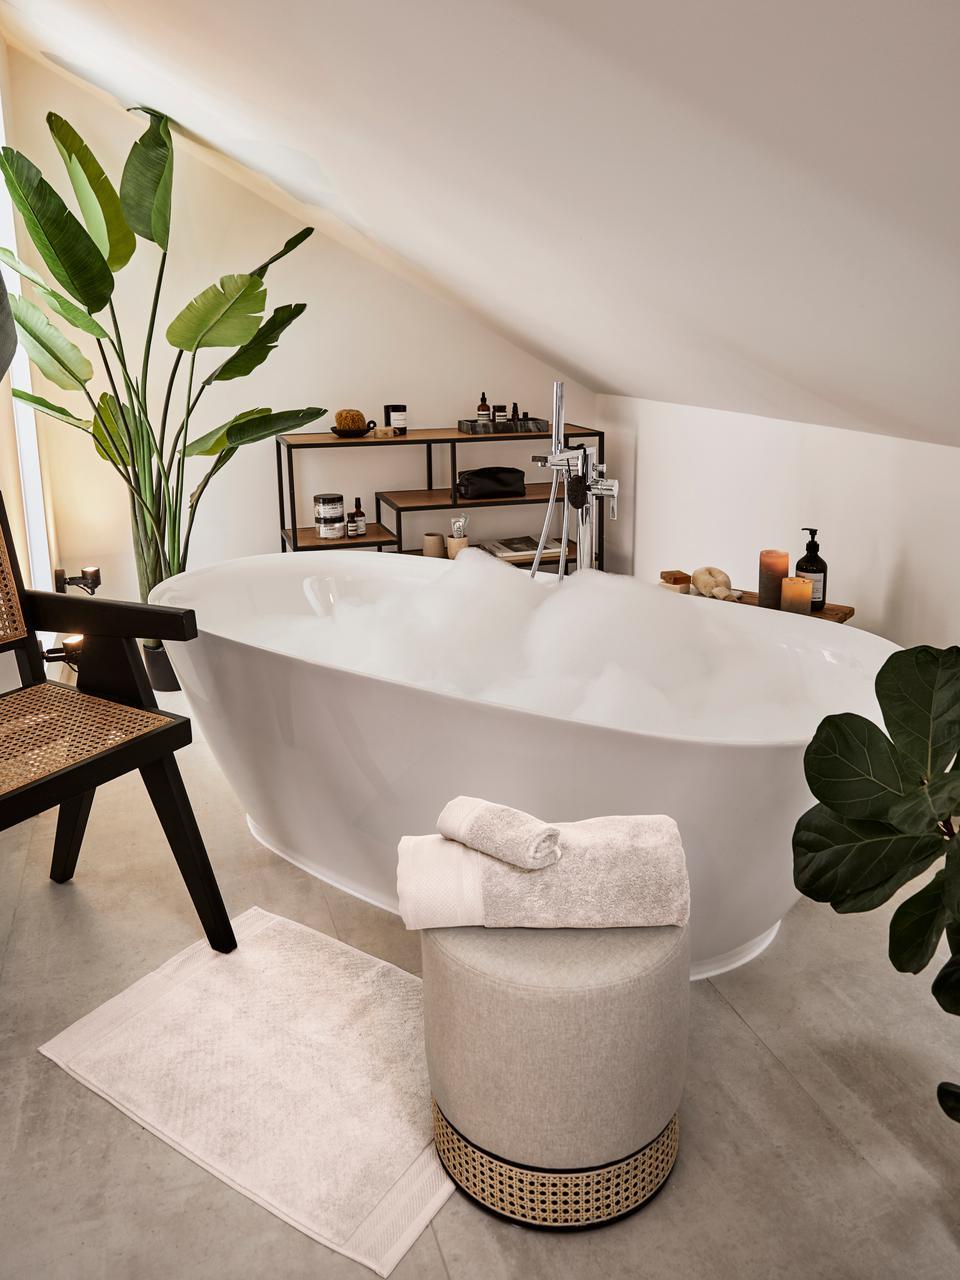 Tapis de bain antidérapant Premium, Beige